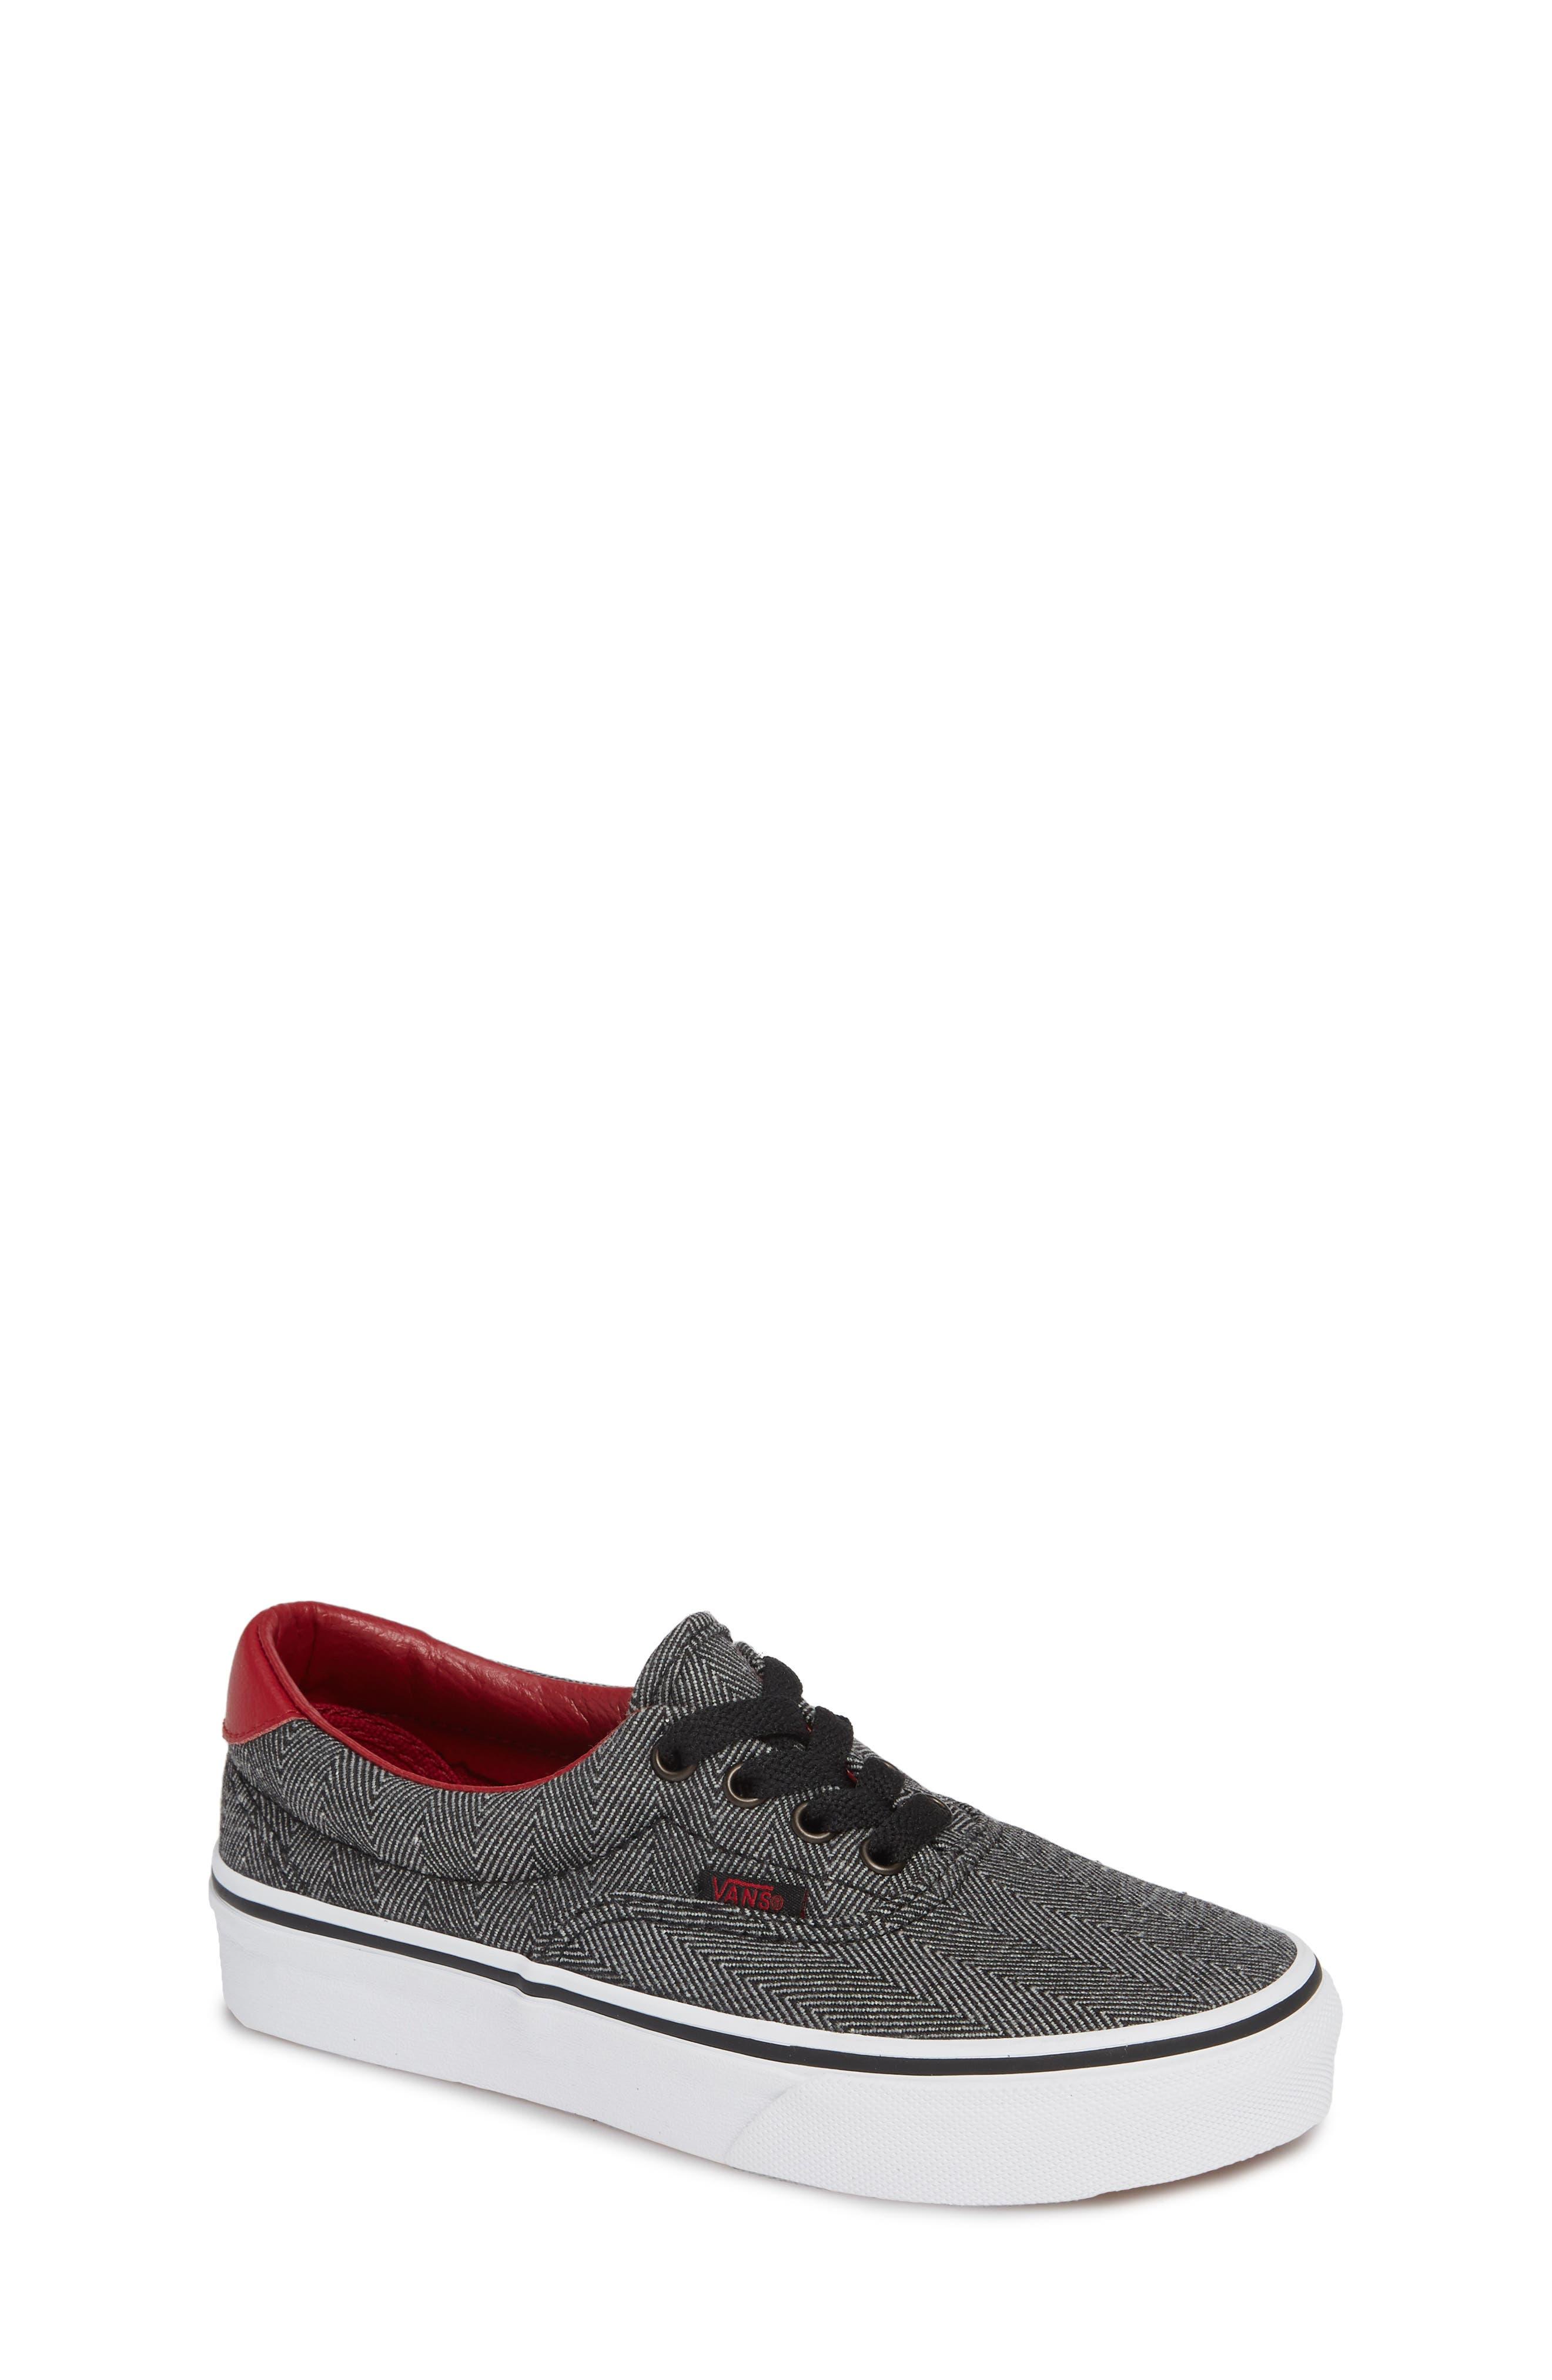 Era 59 Bleacher Sneaker,                         Main,                         color, 002